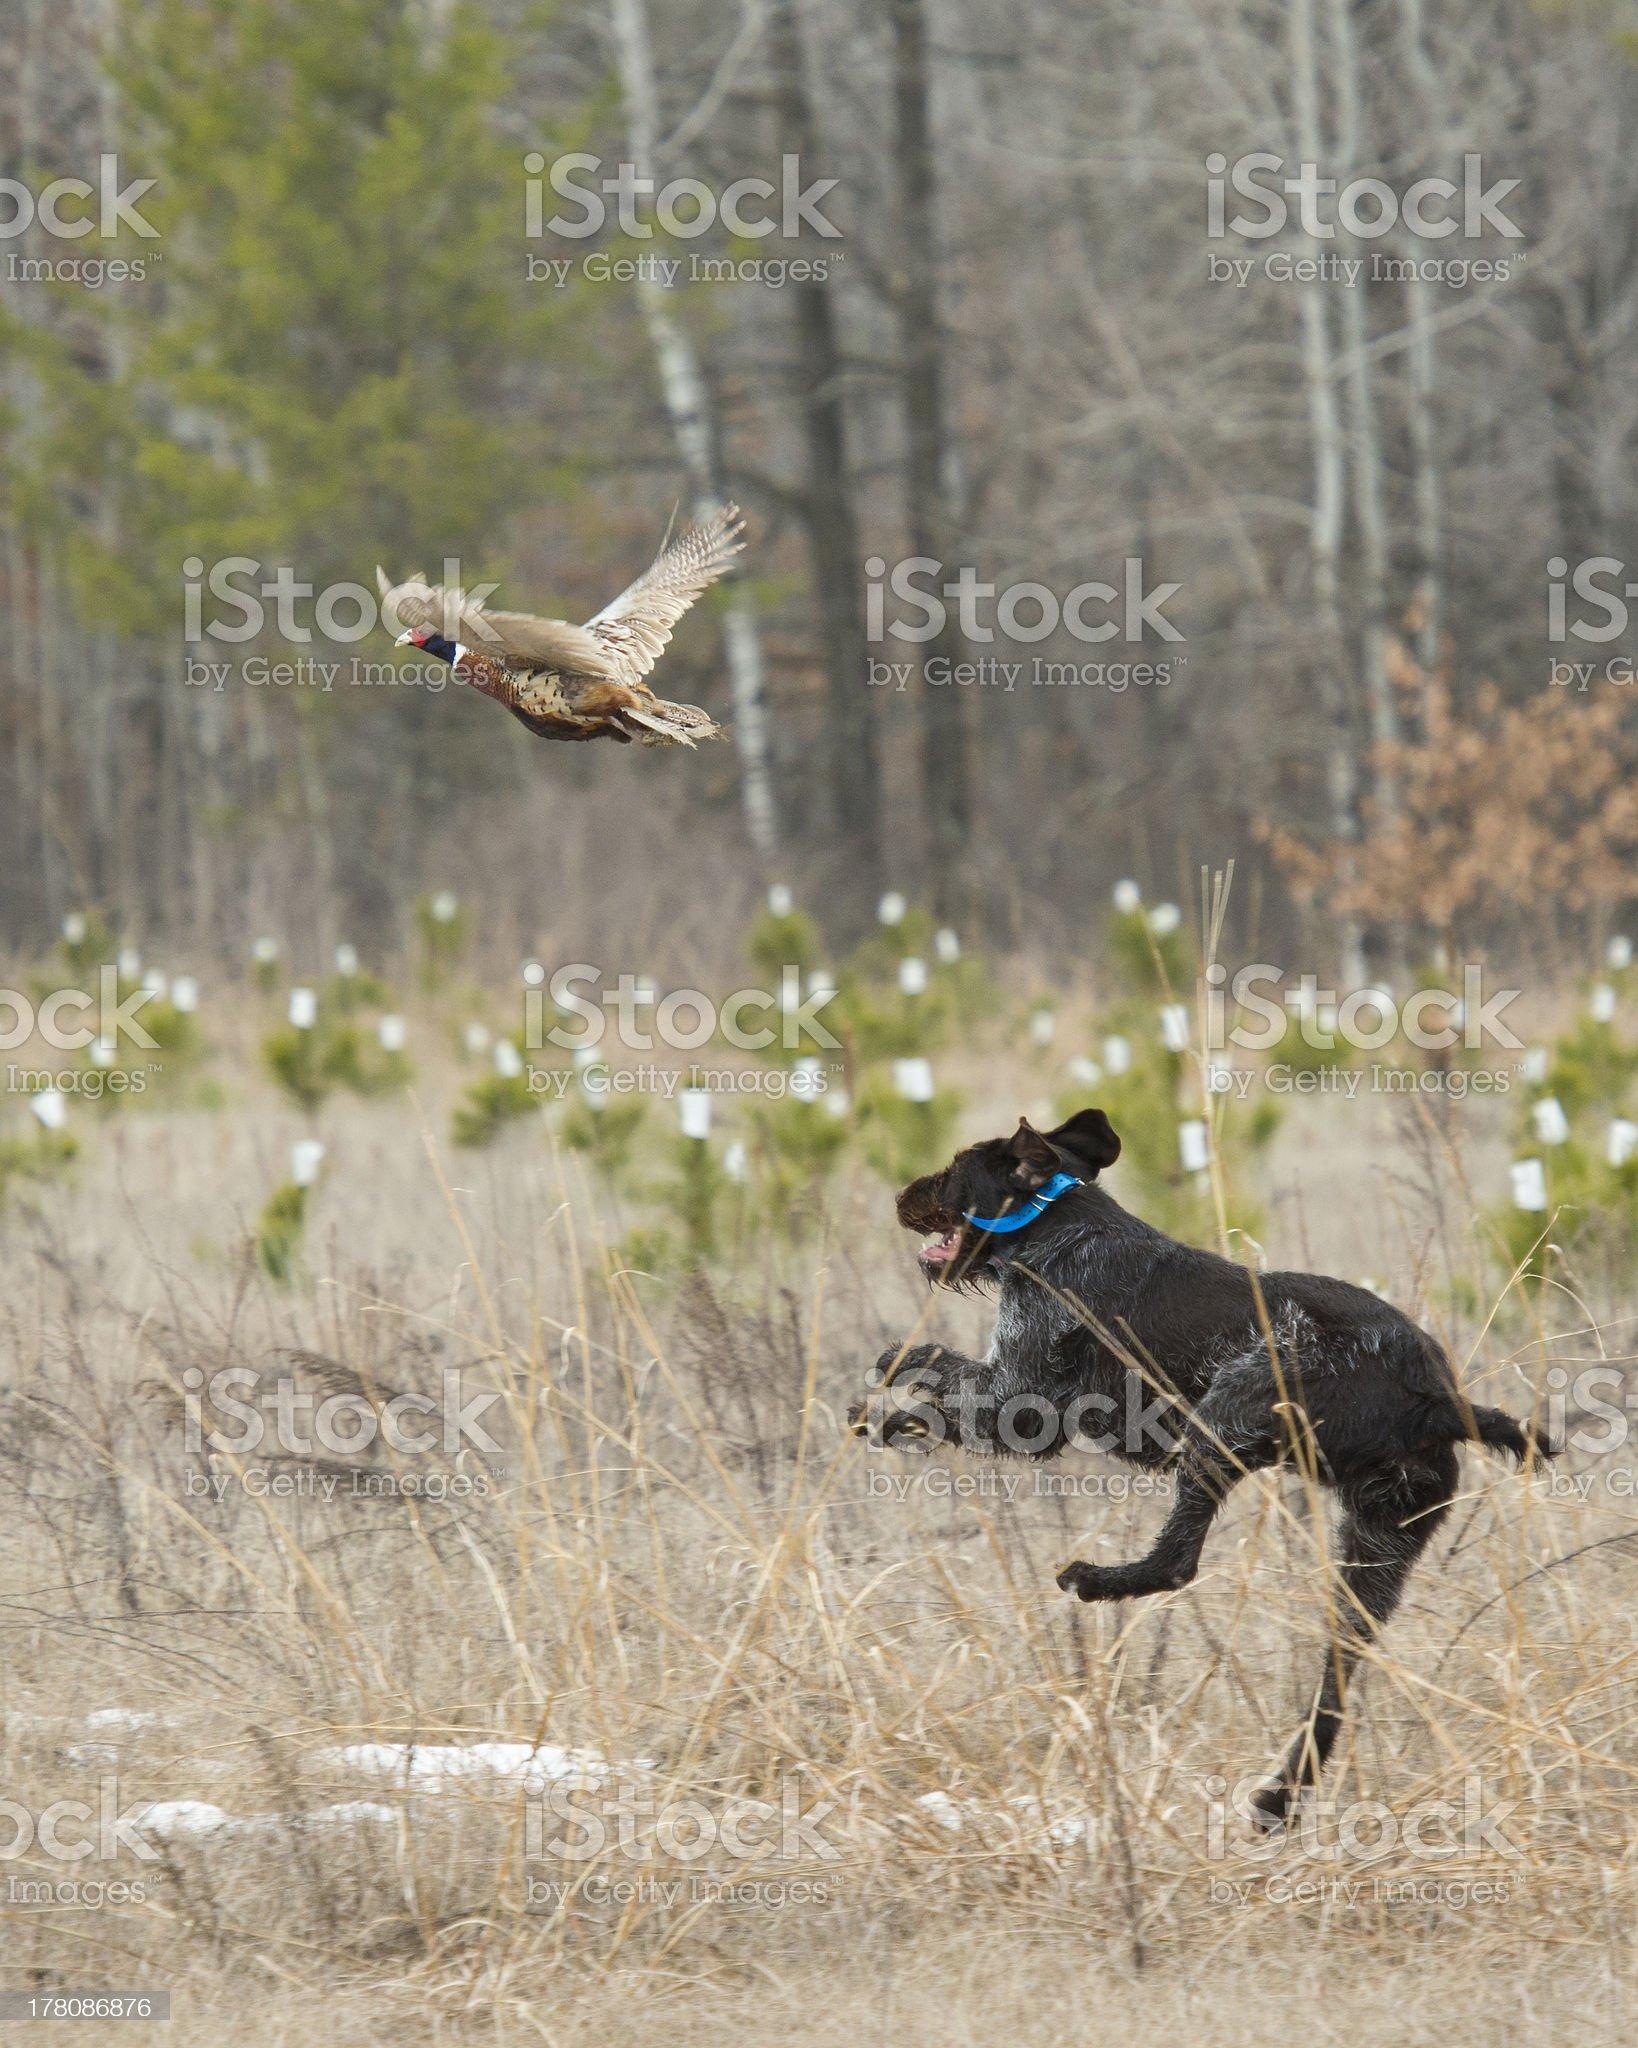 Hunting Pheasants royalty-free stock photo